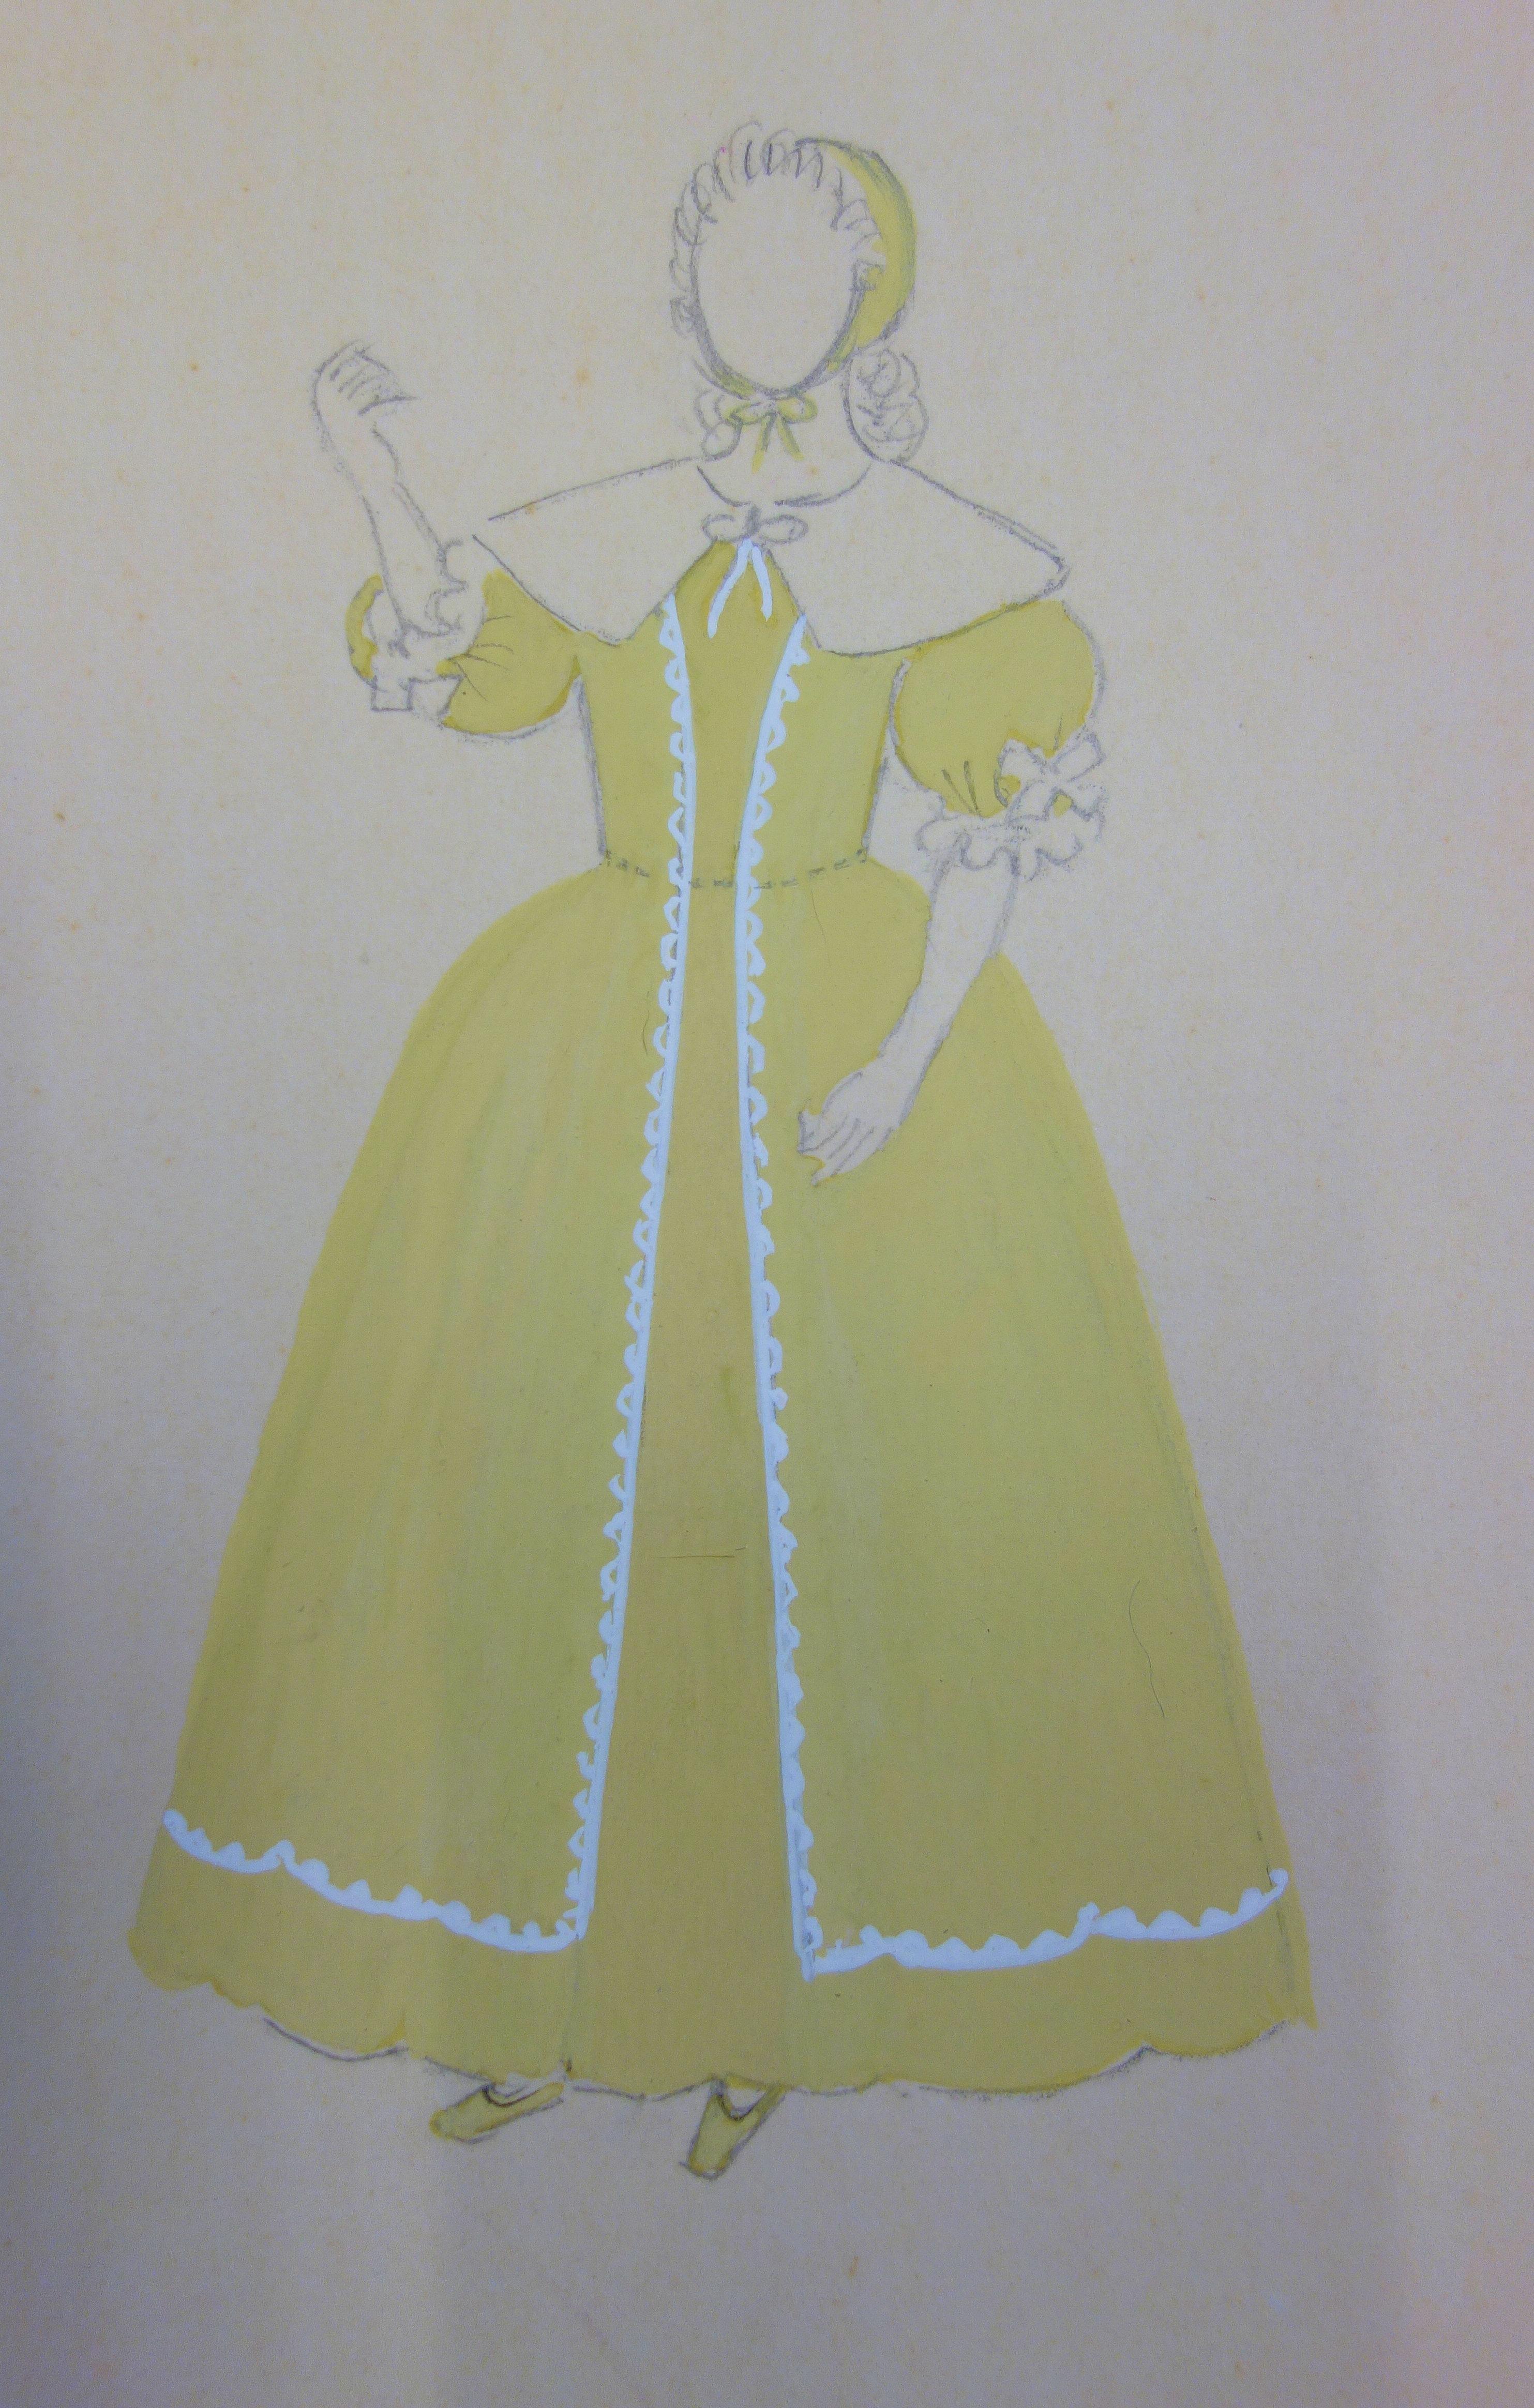 Traditional Yellow Dress - Original watercolor